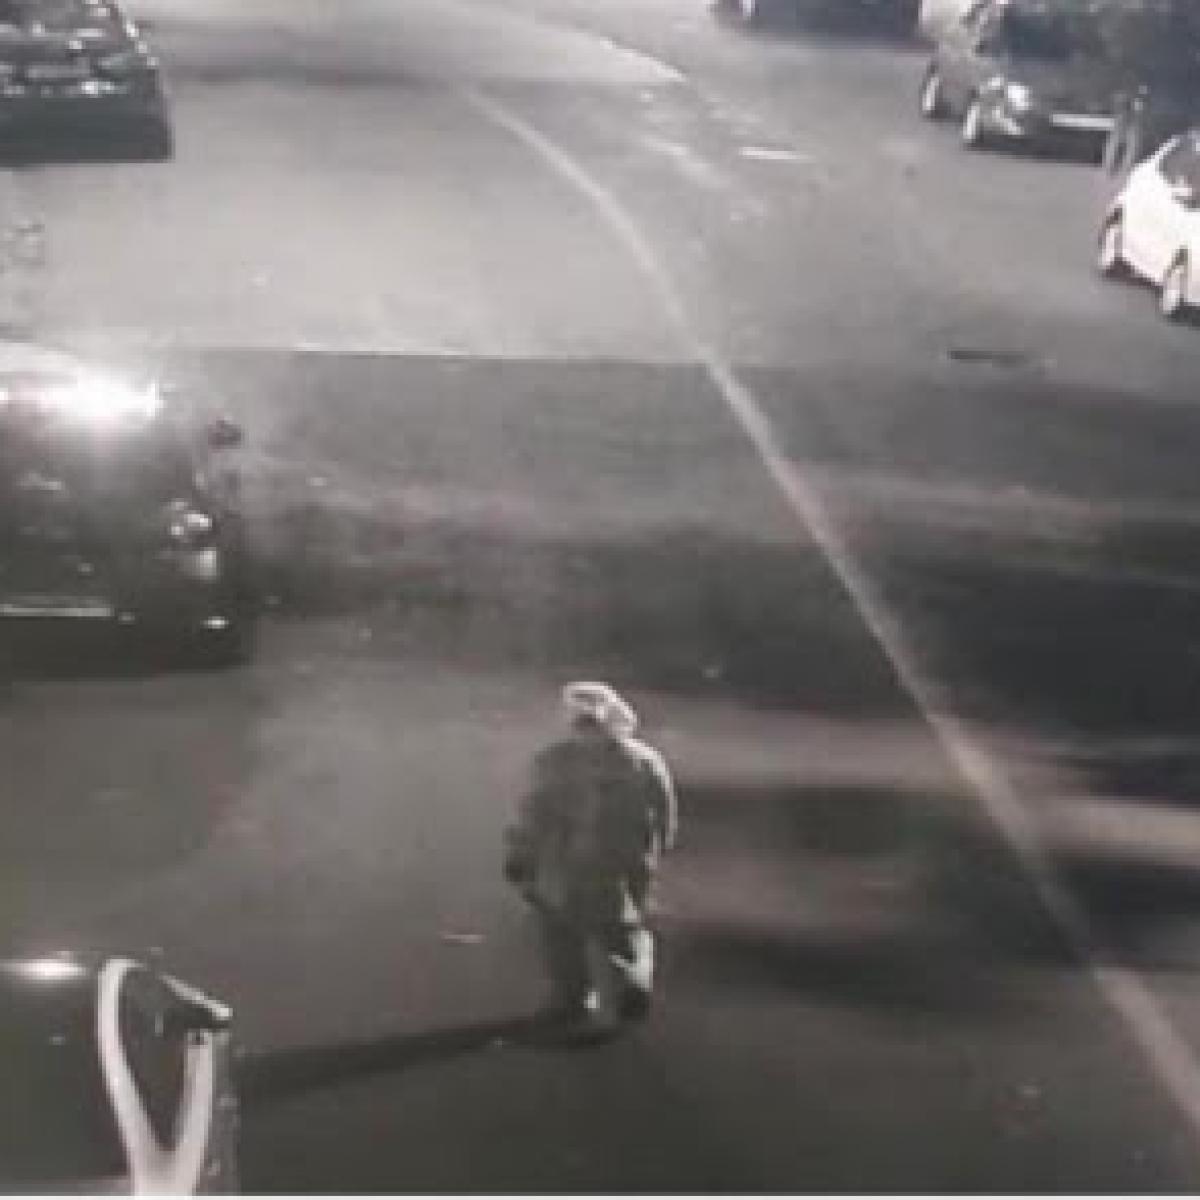 Antilia bomb scare case: In CCTV footage, Sachin Vaze seen wearing oversized kurta-pajama, not PPE coverall, says NIA